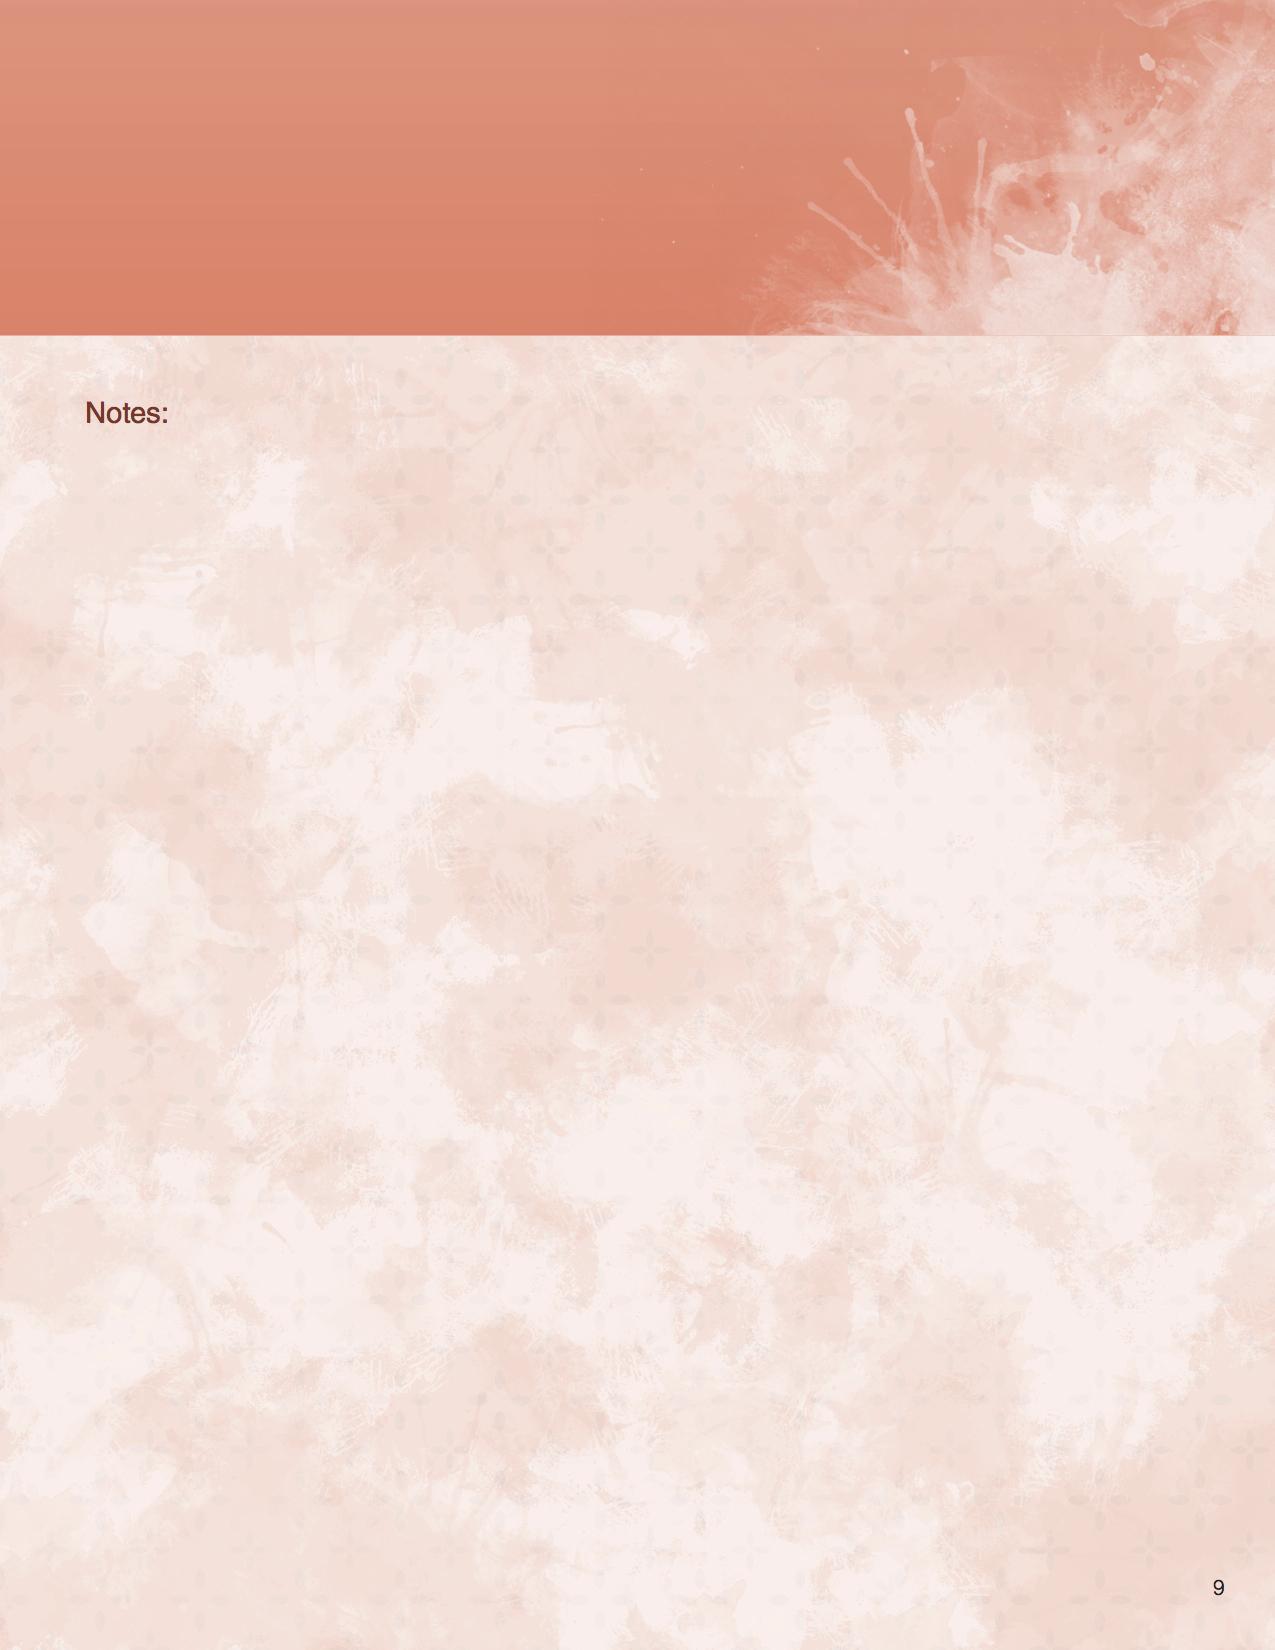 avanttot-print (2) (dragged) 11.jpeg